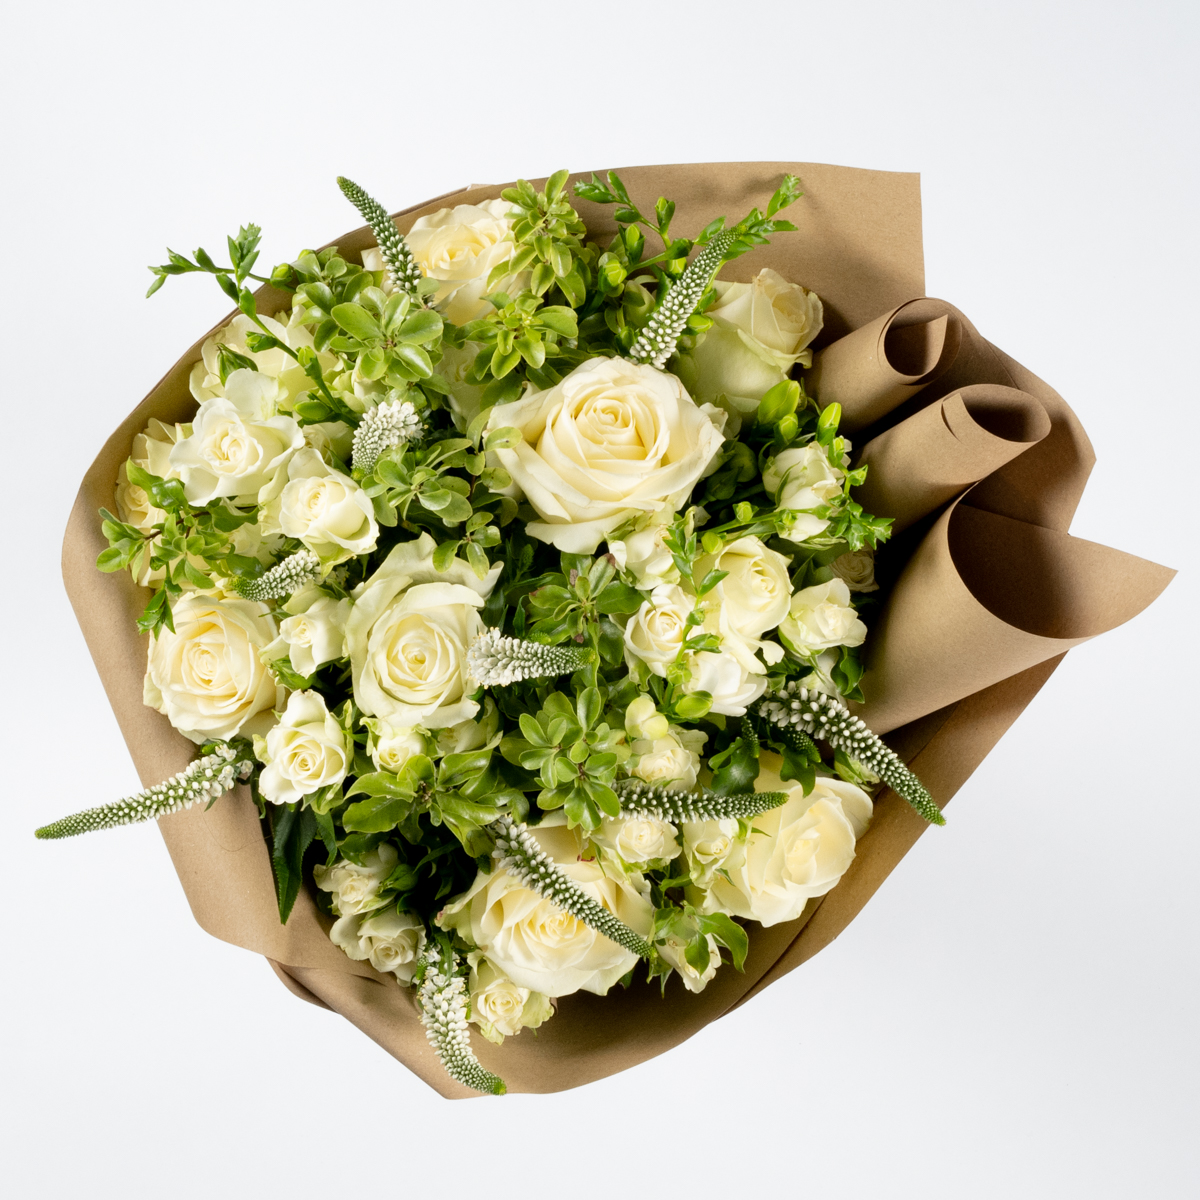 Bloom Flower Delivery | Bloomsbury Bouquet